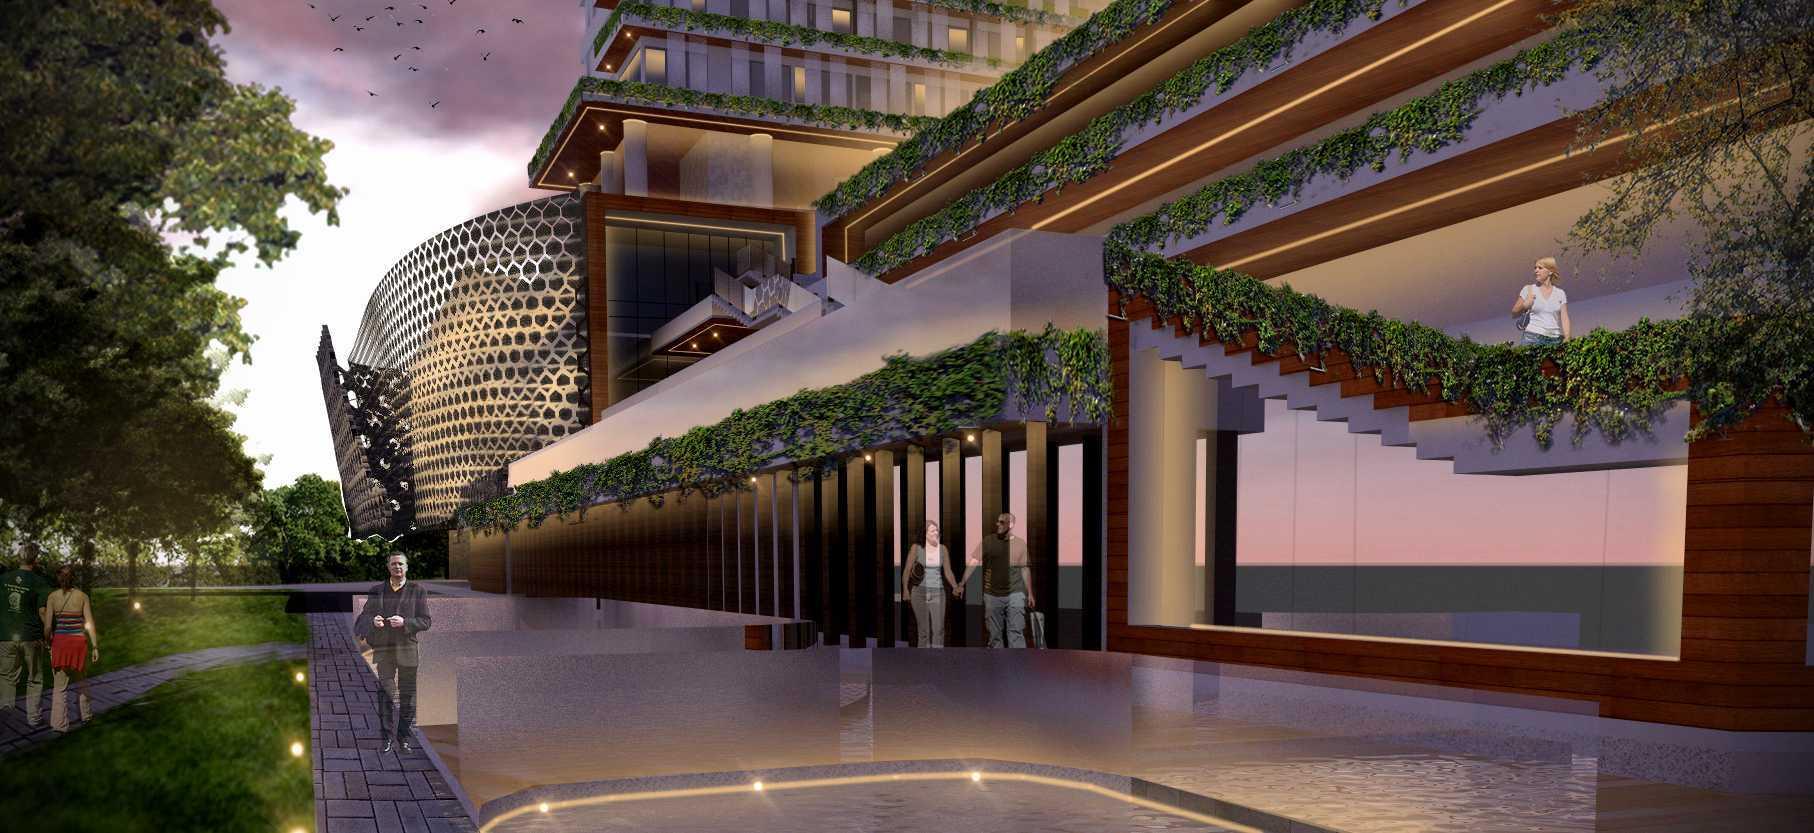 Wirianto Witarsa Sinarmasland Young Architect Competition 2015 Jakarta Jakarta Eksterior 1   18643